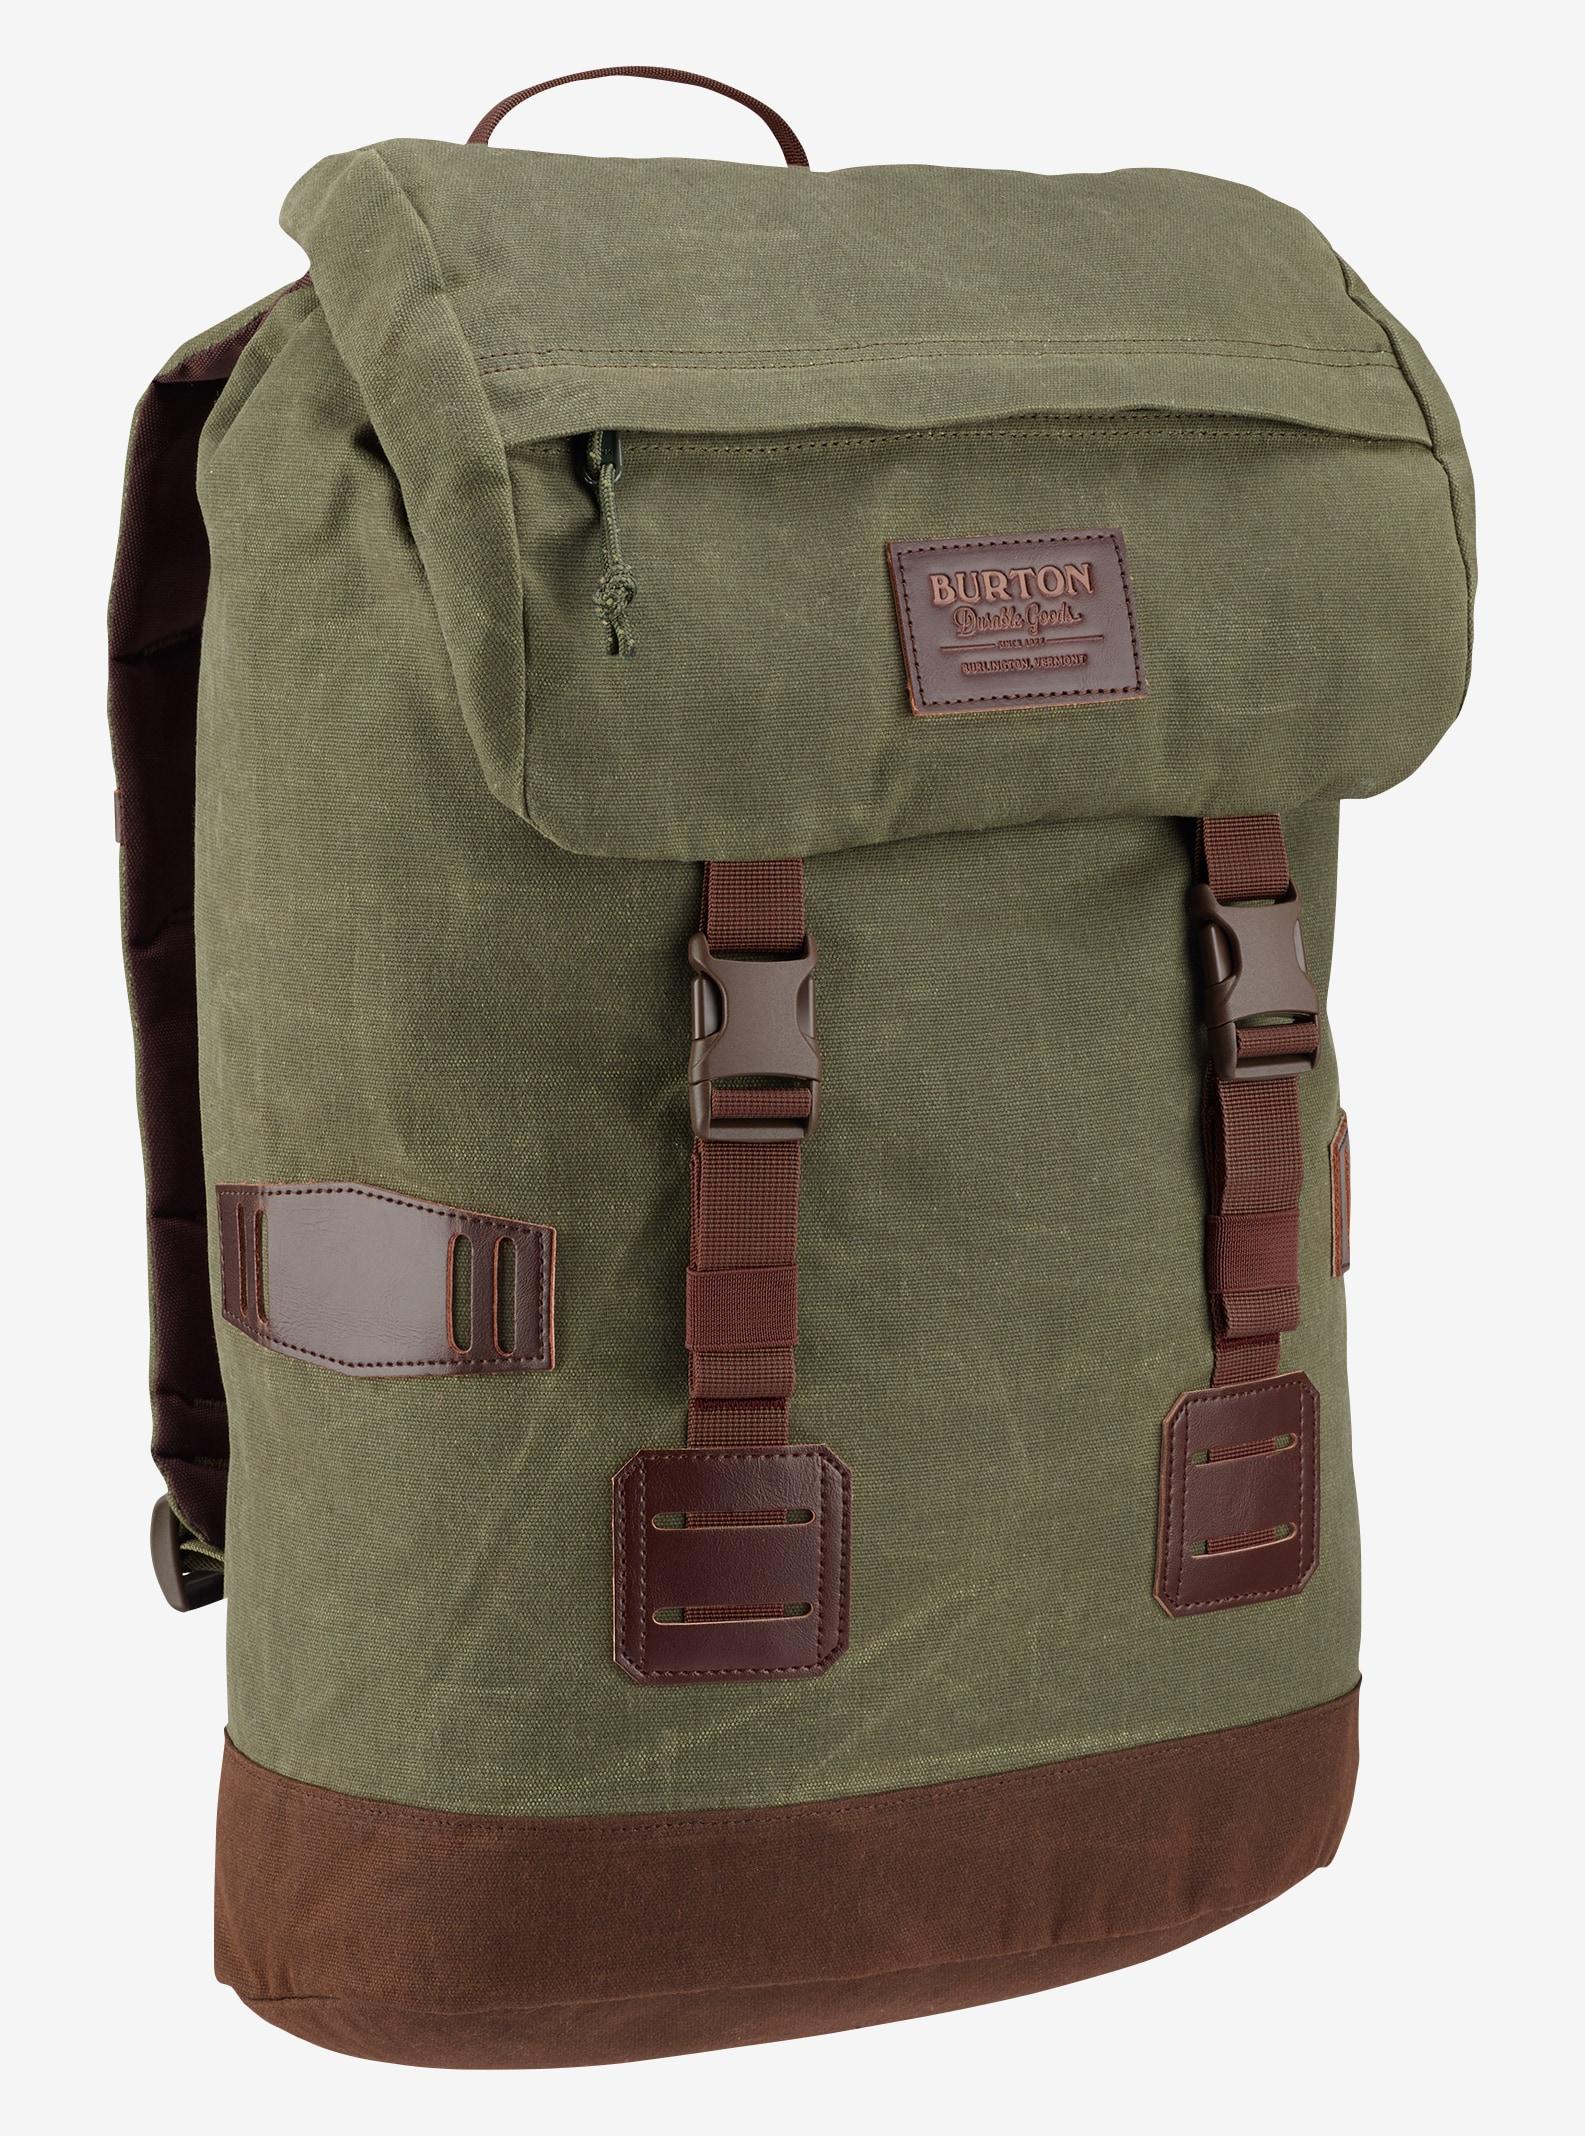 Shop All Bags | Burton Snowboards